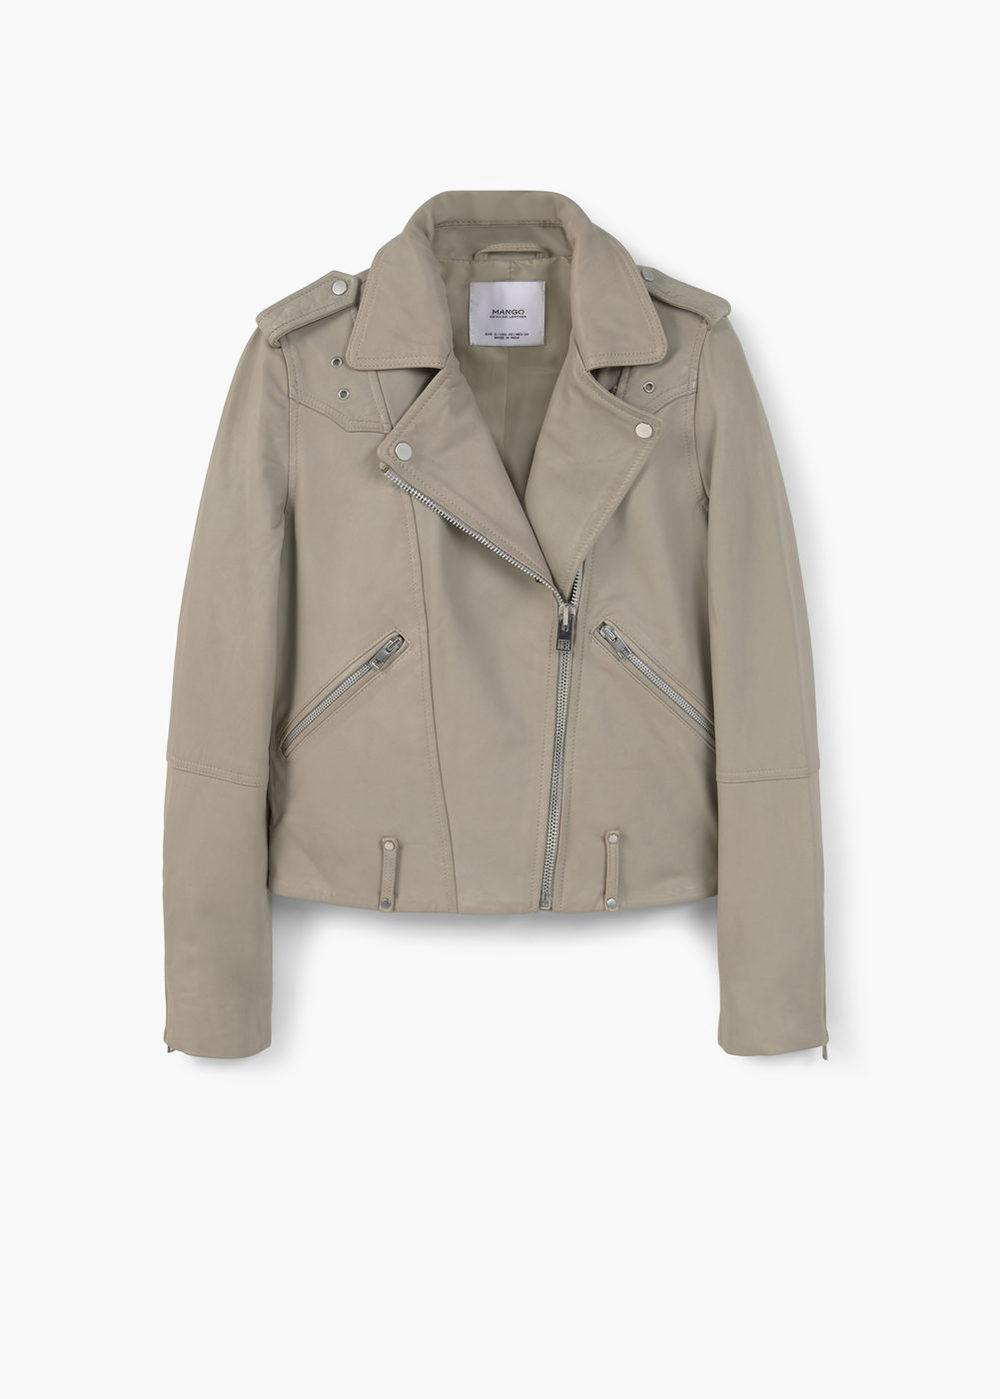 To Mango Biker Jacket που σκοπεύω να φοράω σχεδόν συνέχεια!